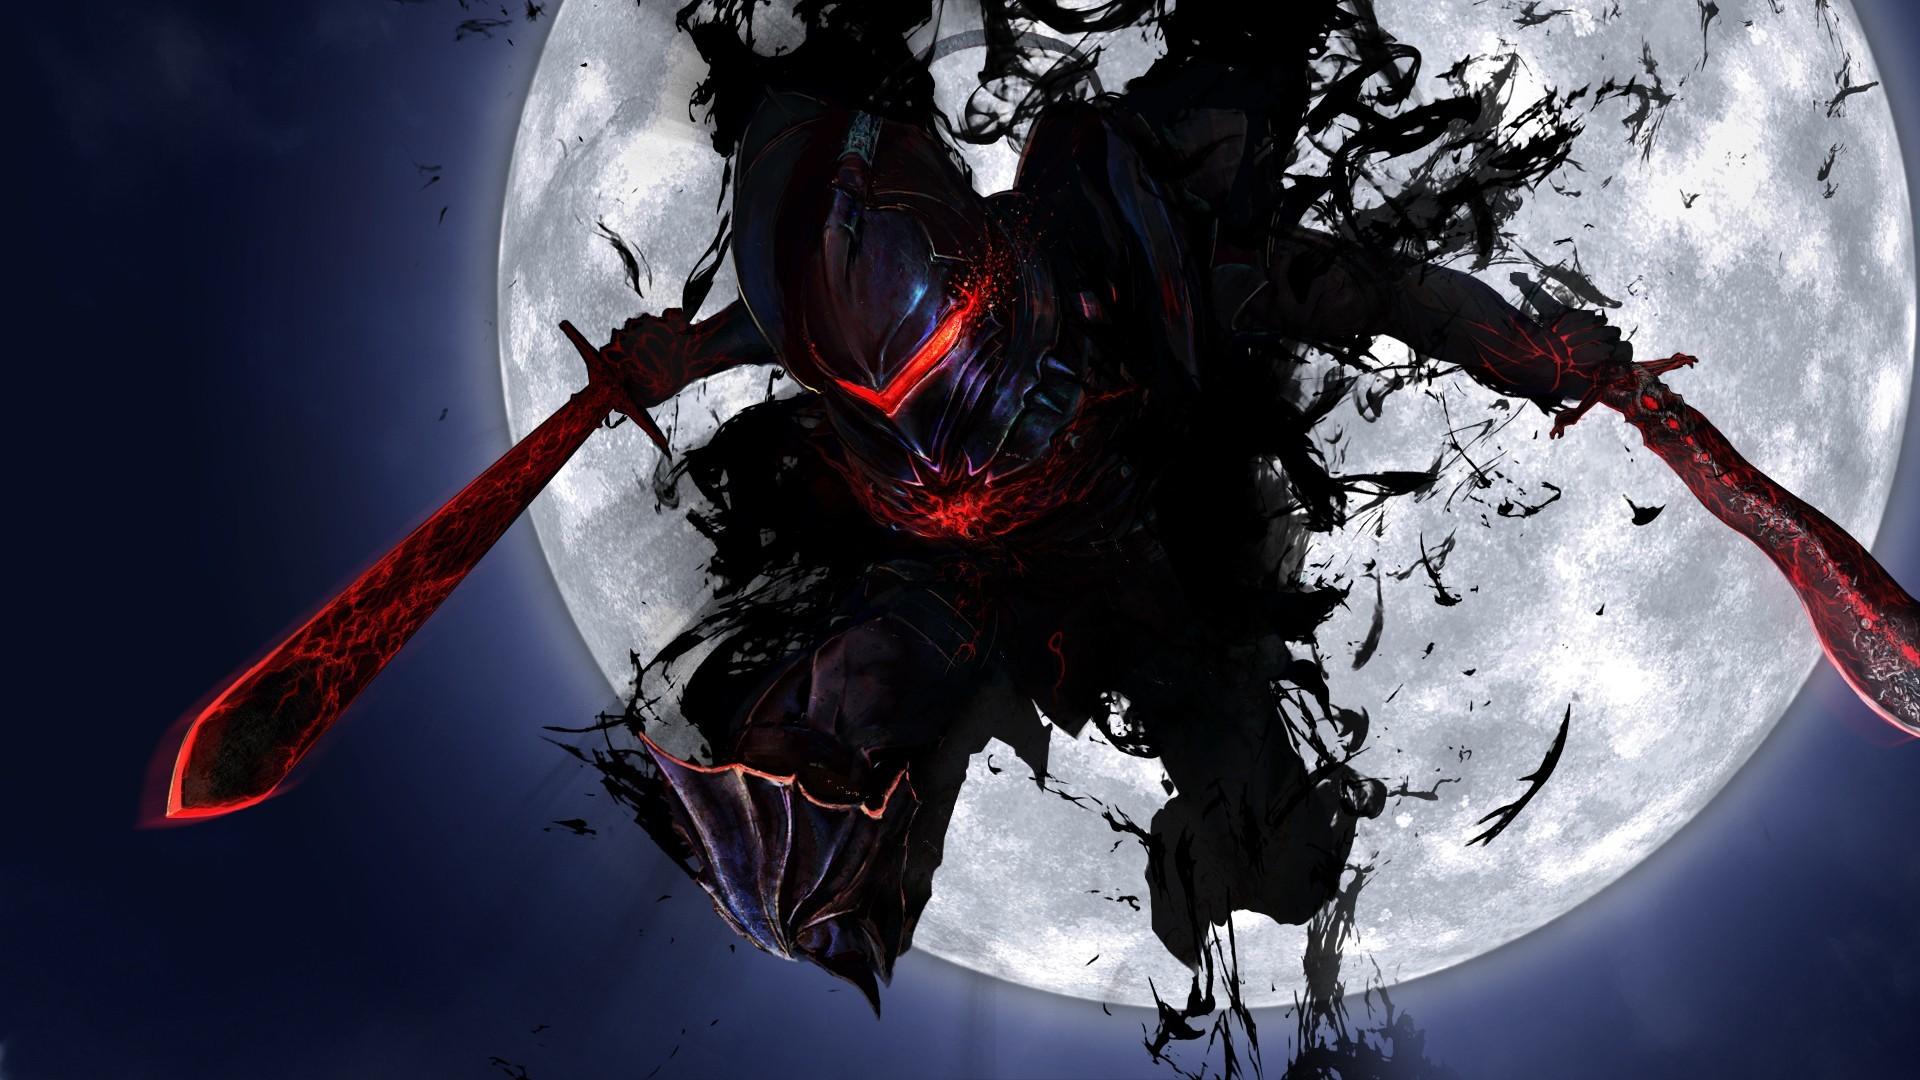 Anime – Fate/Zero Berserker (Fate/Zero) Wallpaper